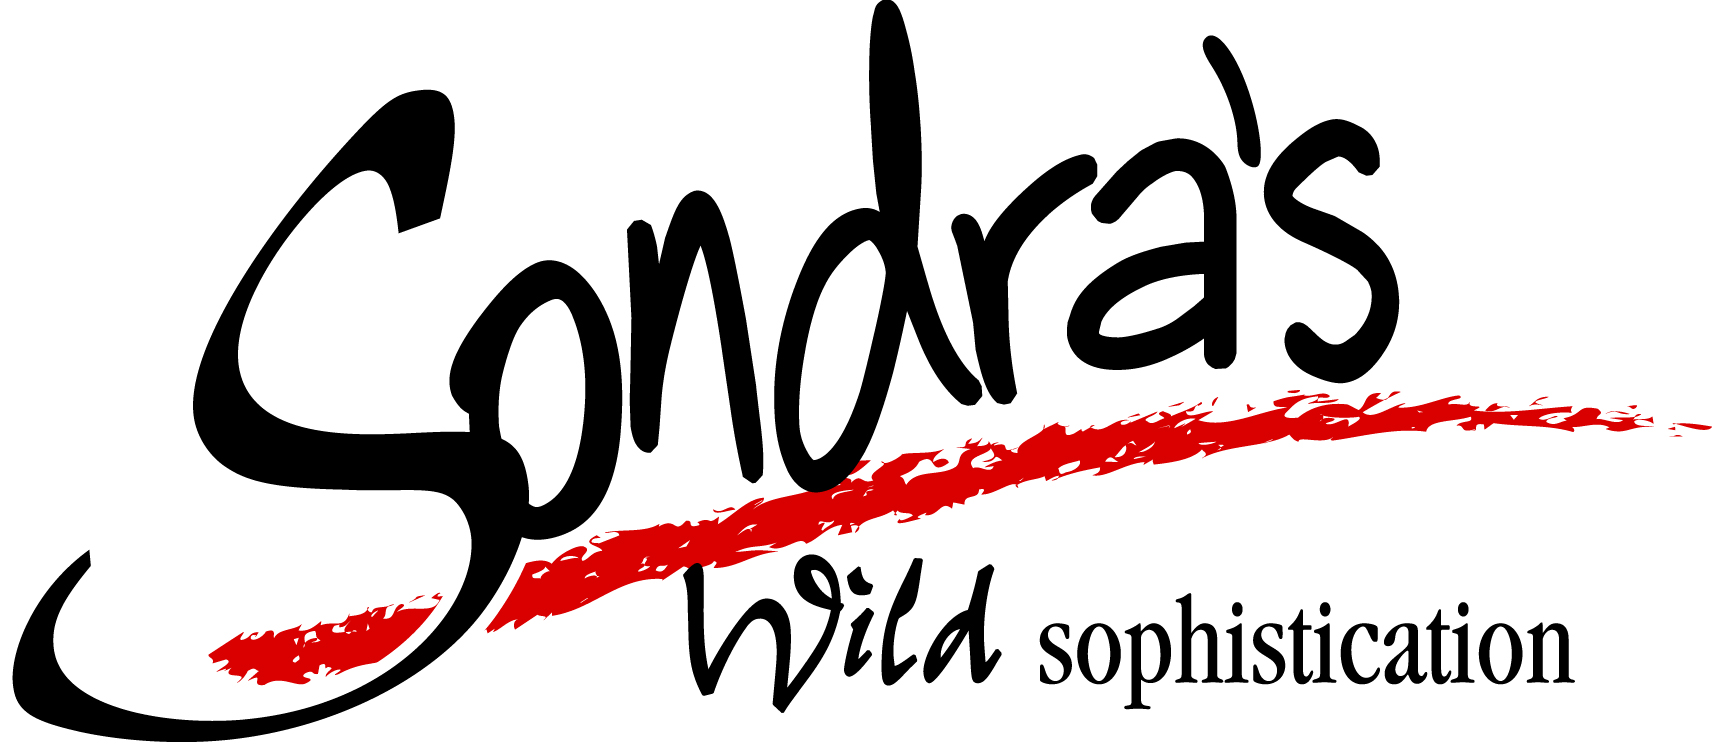 Bronze Sponsor - Sondra's Wild Sophistication - Logo